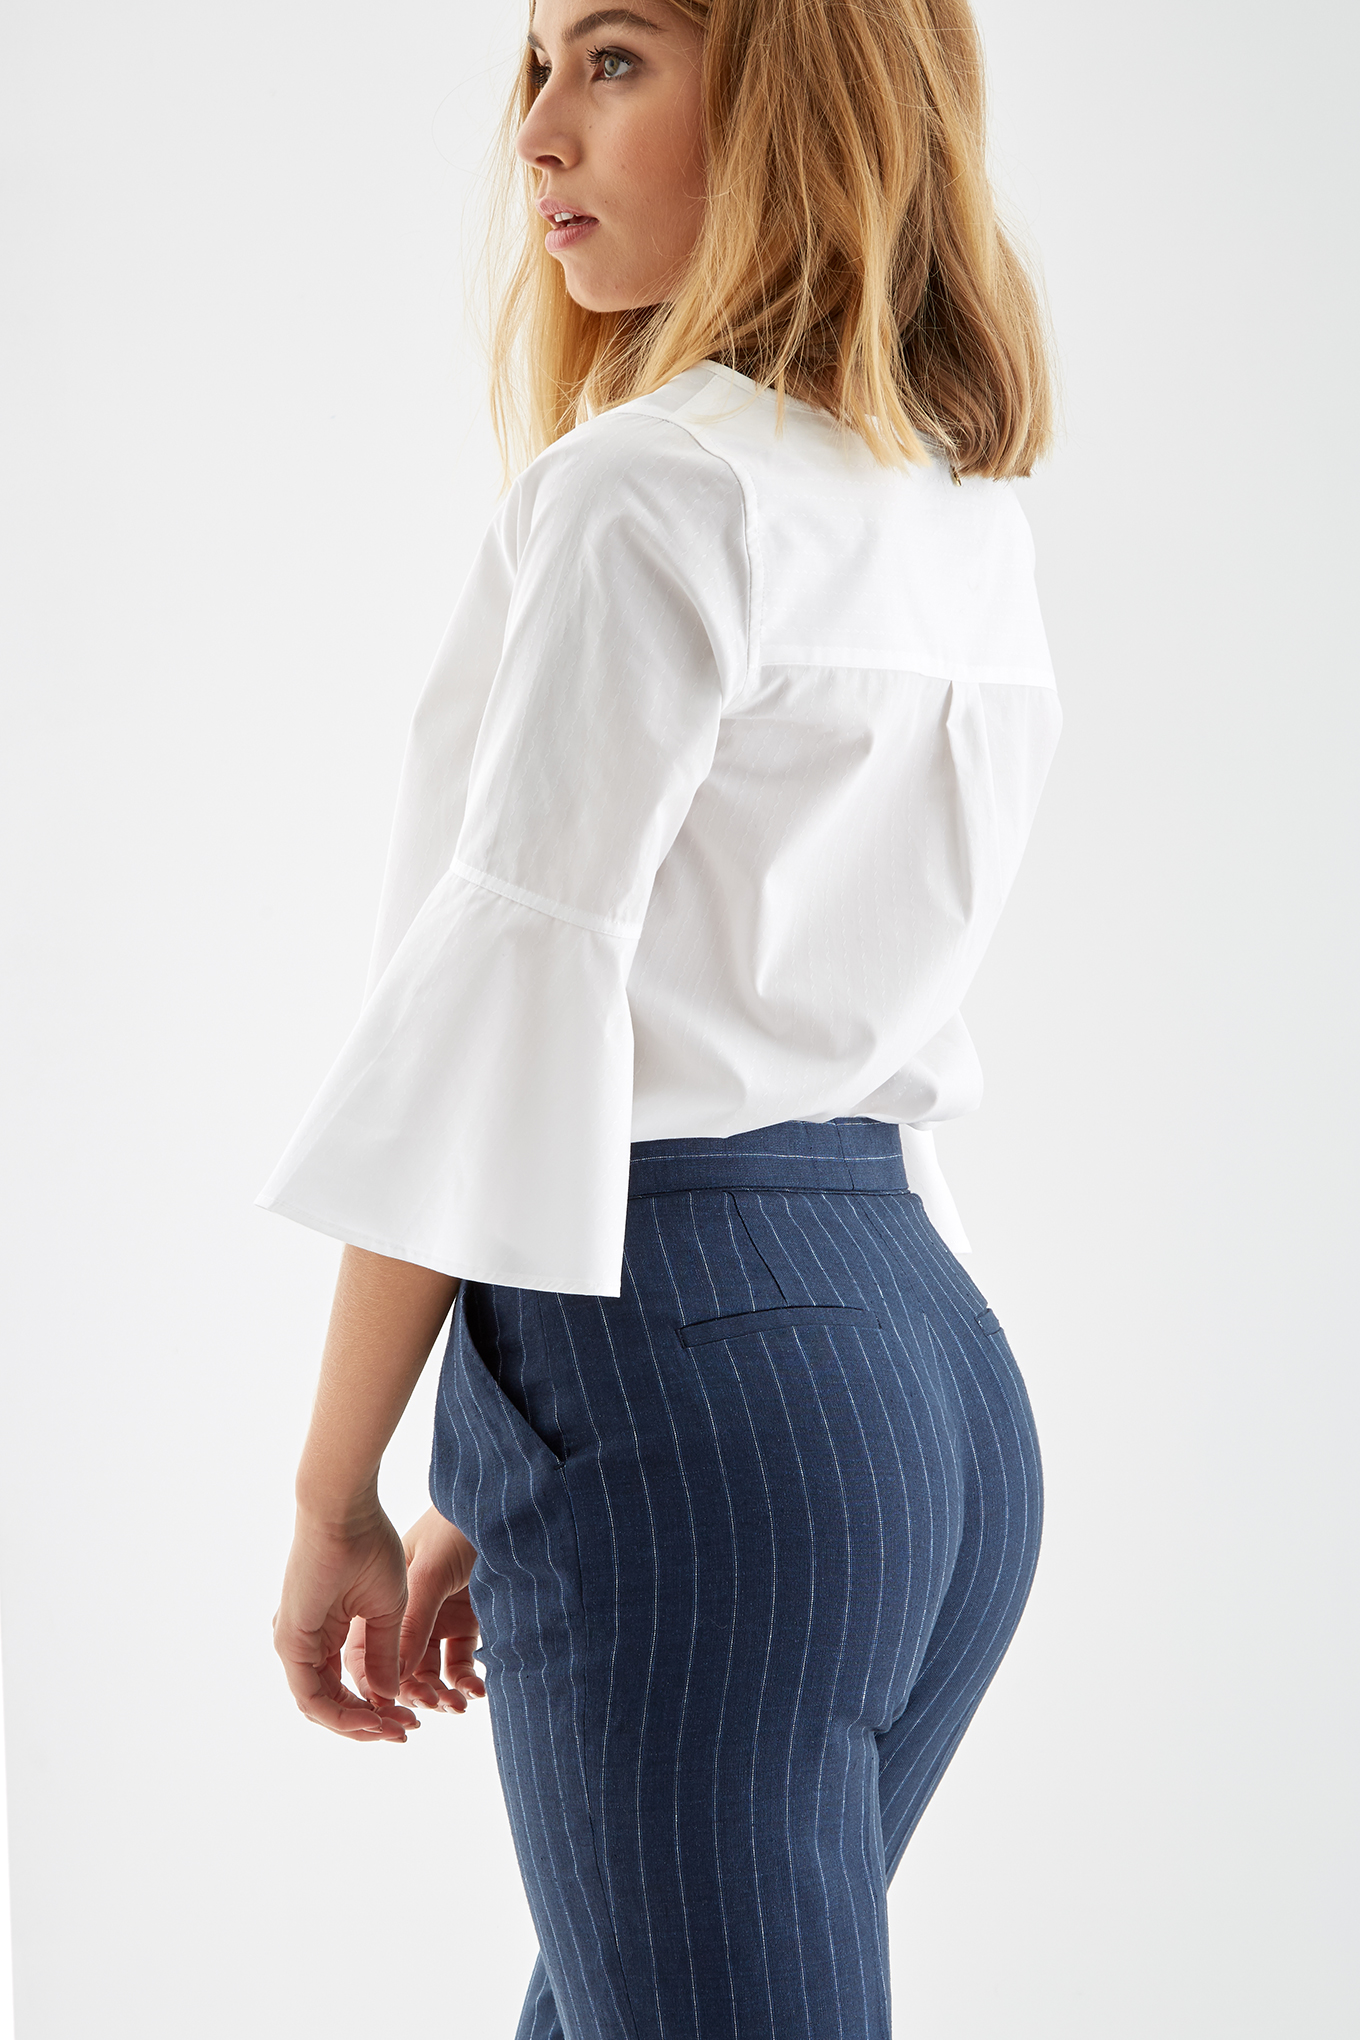 Blusa Branco Casual Mulher